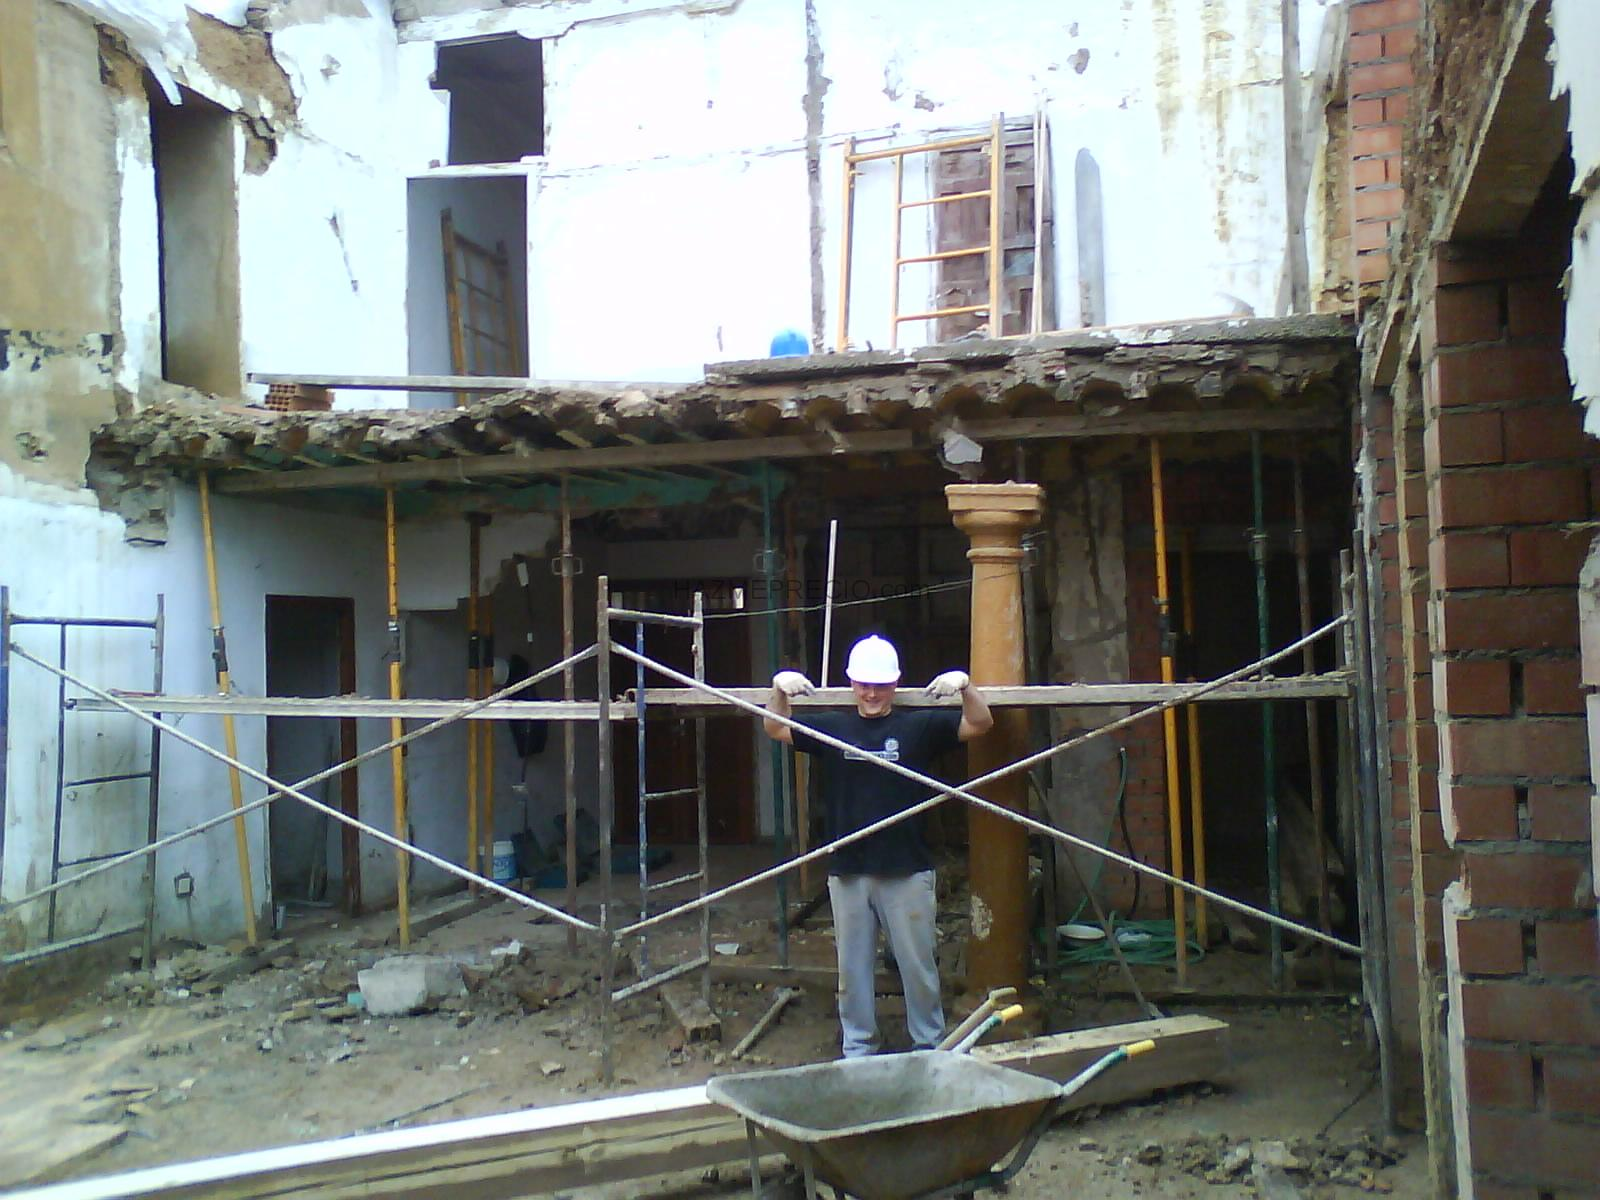 Rehabilitaci n casa antigua madridejos toledo - Rehabilitacion de casas antiguas ...